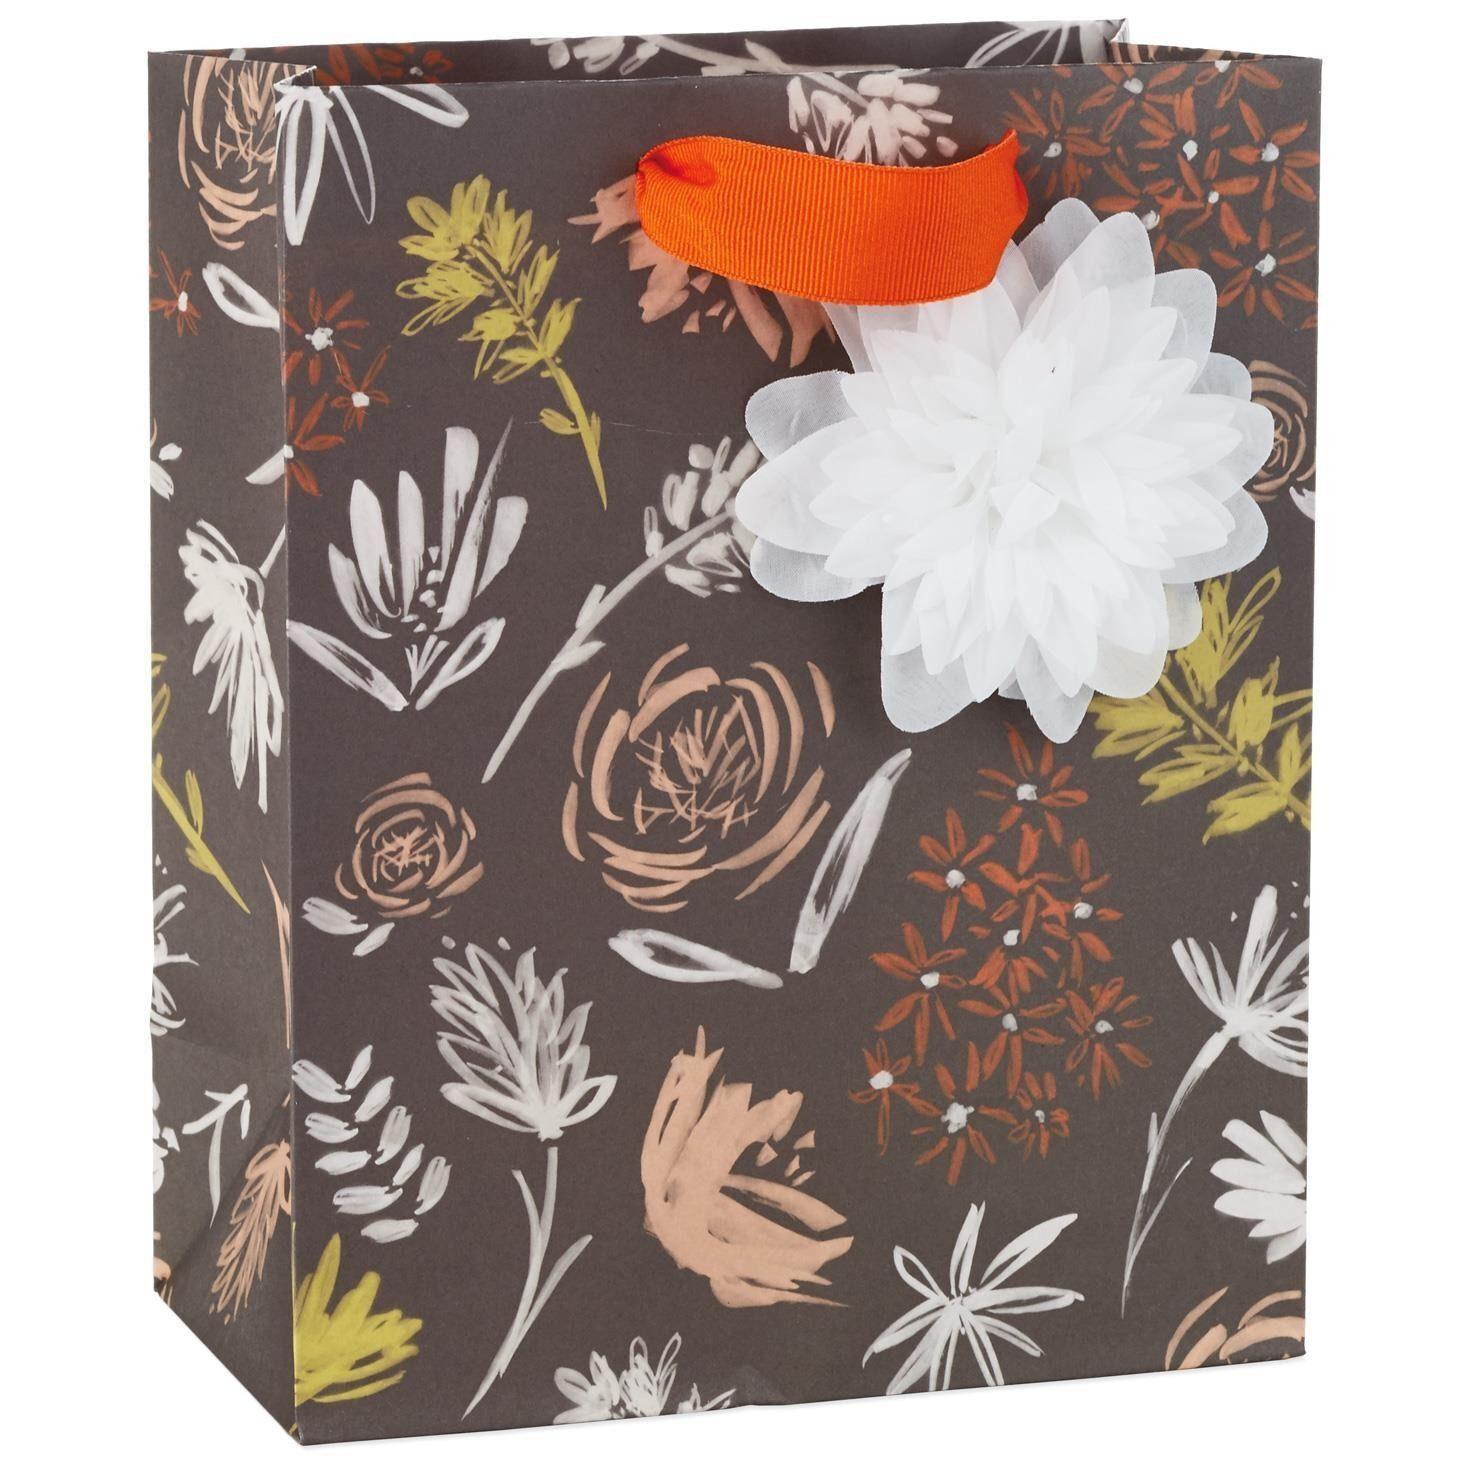 Hallmark Floral Chalked Medium Gift Bag